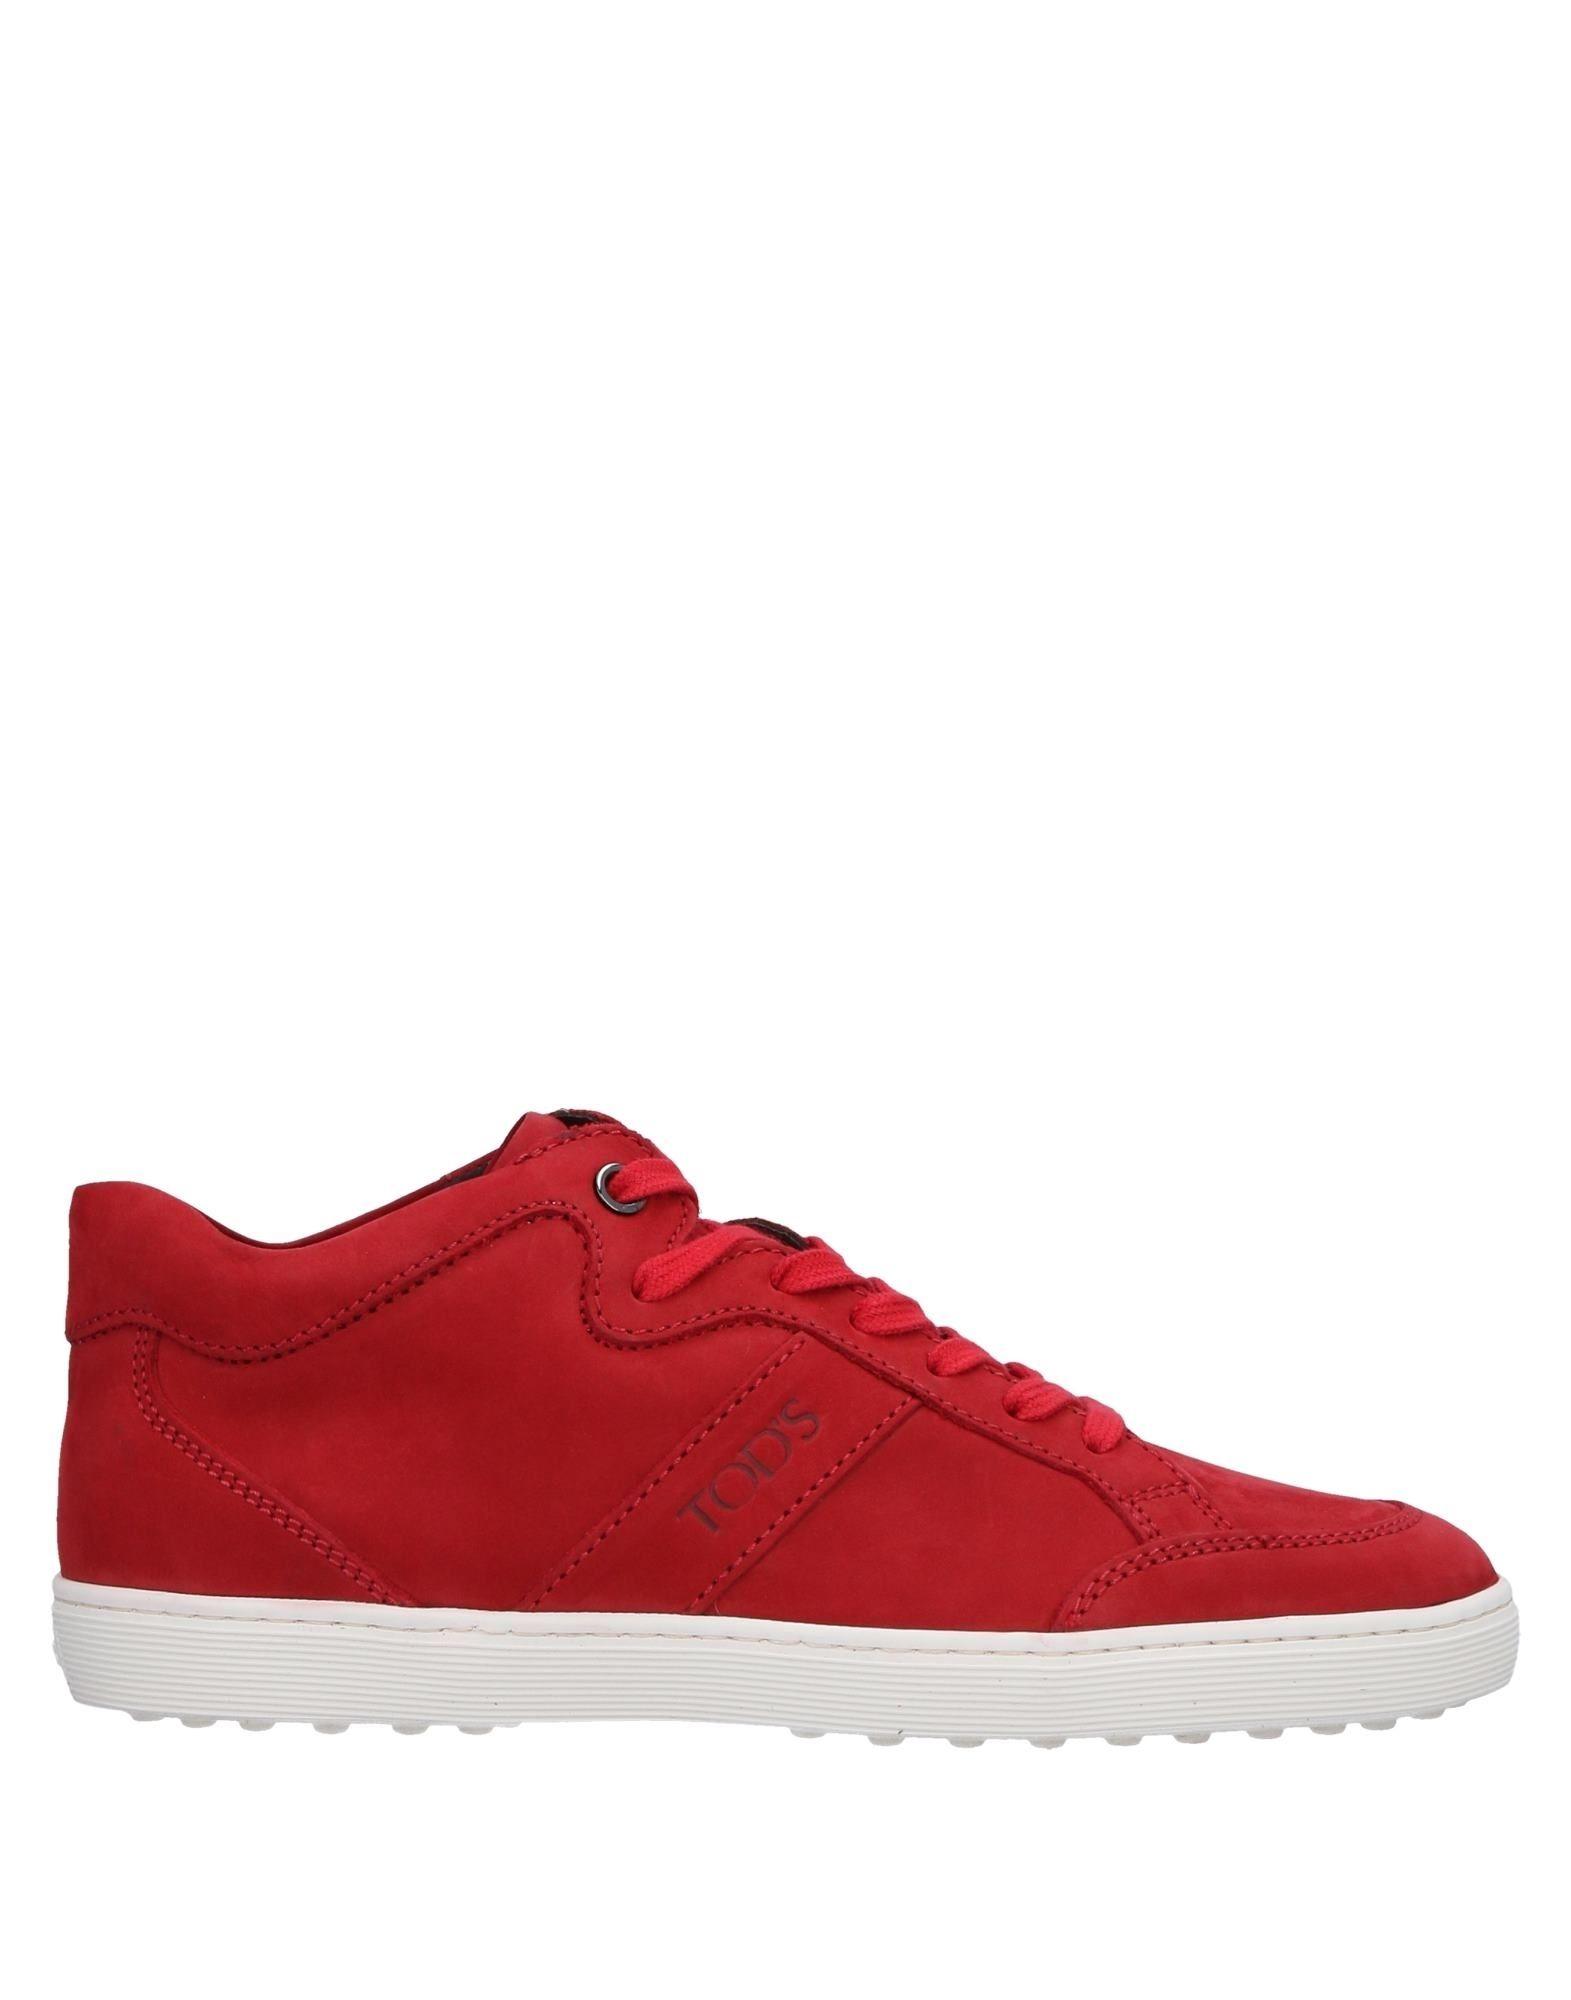 Tod's Sneakers Damen  11311145KVGut aussehende strapazierfähige Schuhe